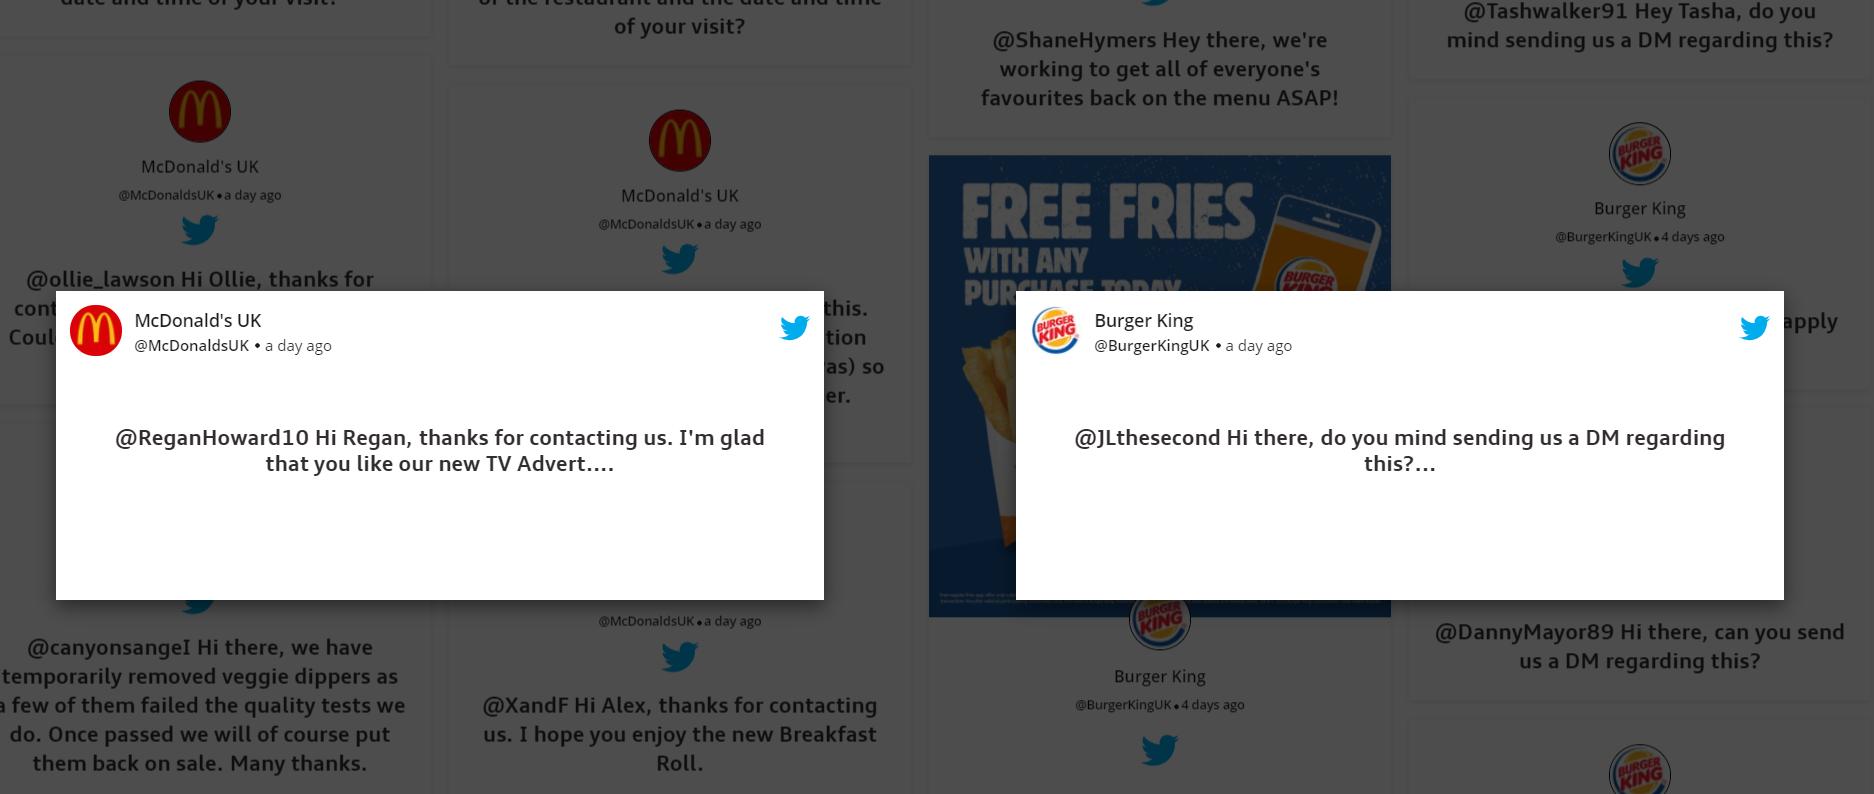 McDonald's vs burger king